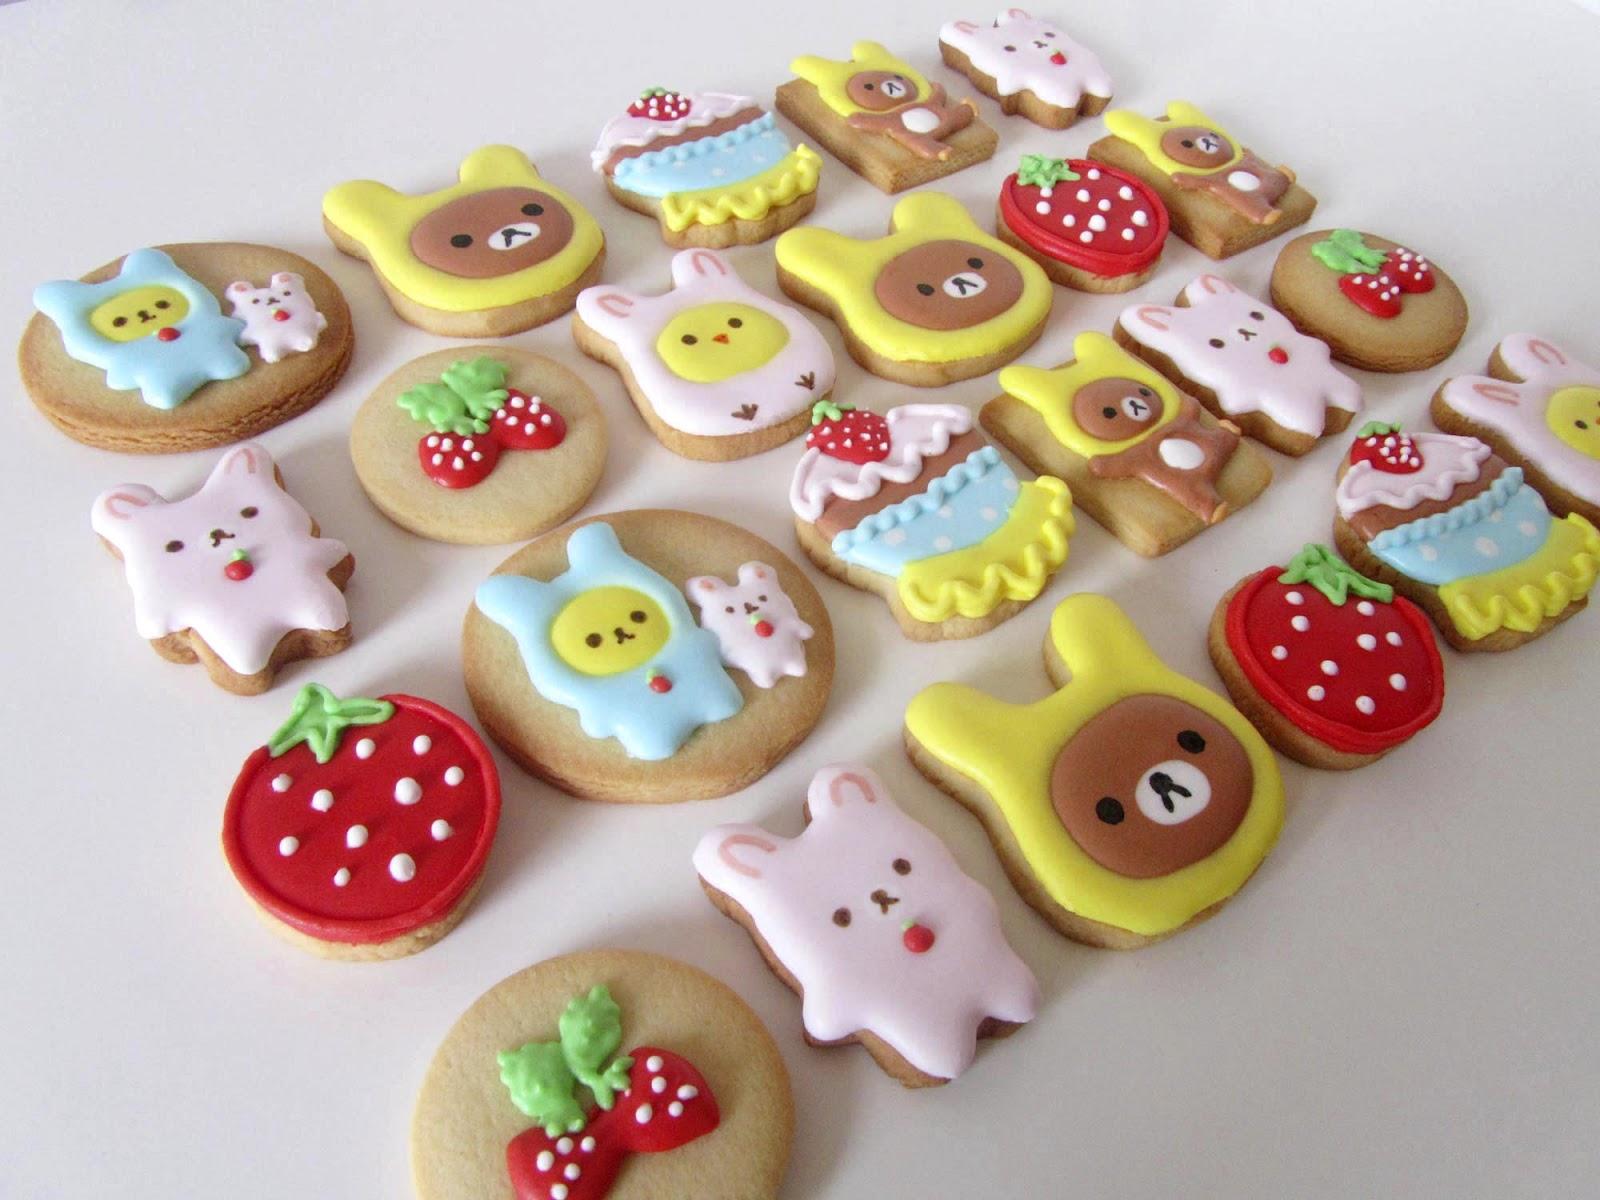 Galletas decoradas: kawaii   Postreadicción: Cursos de pastelería ...